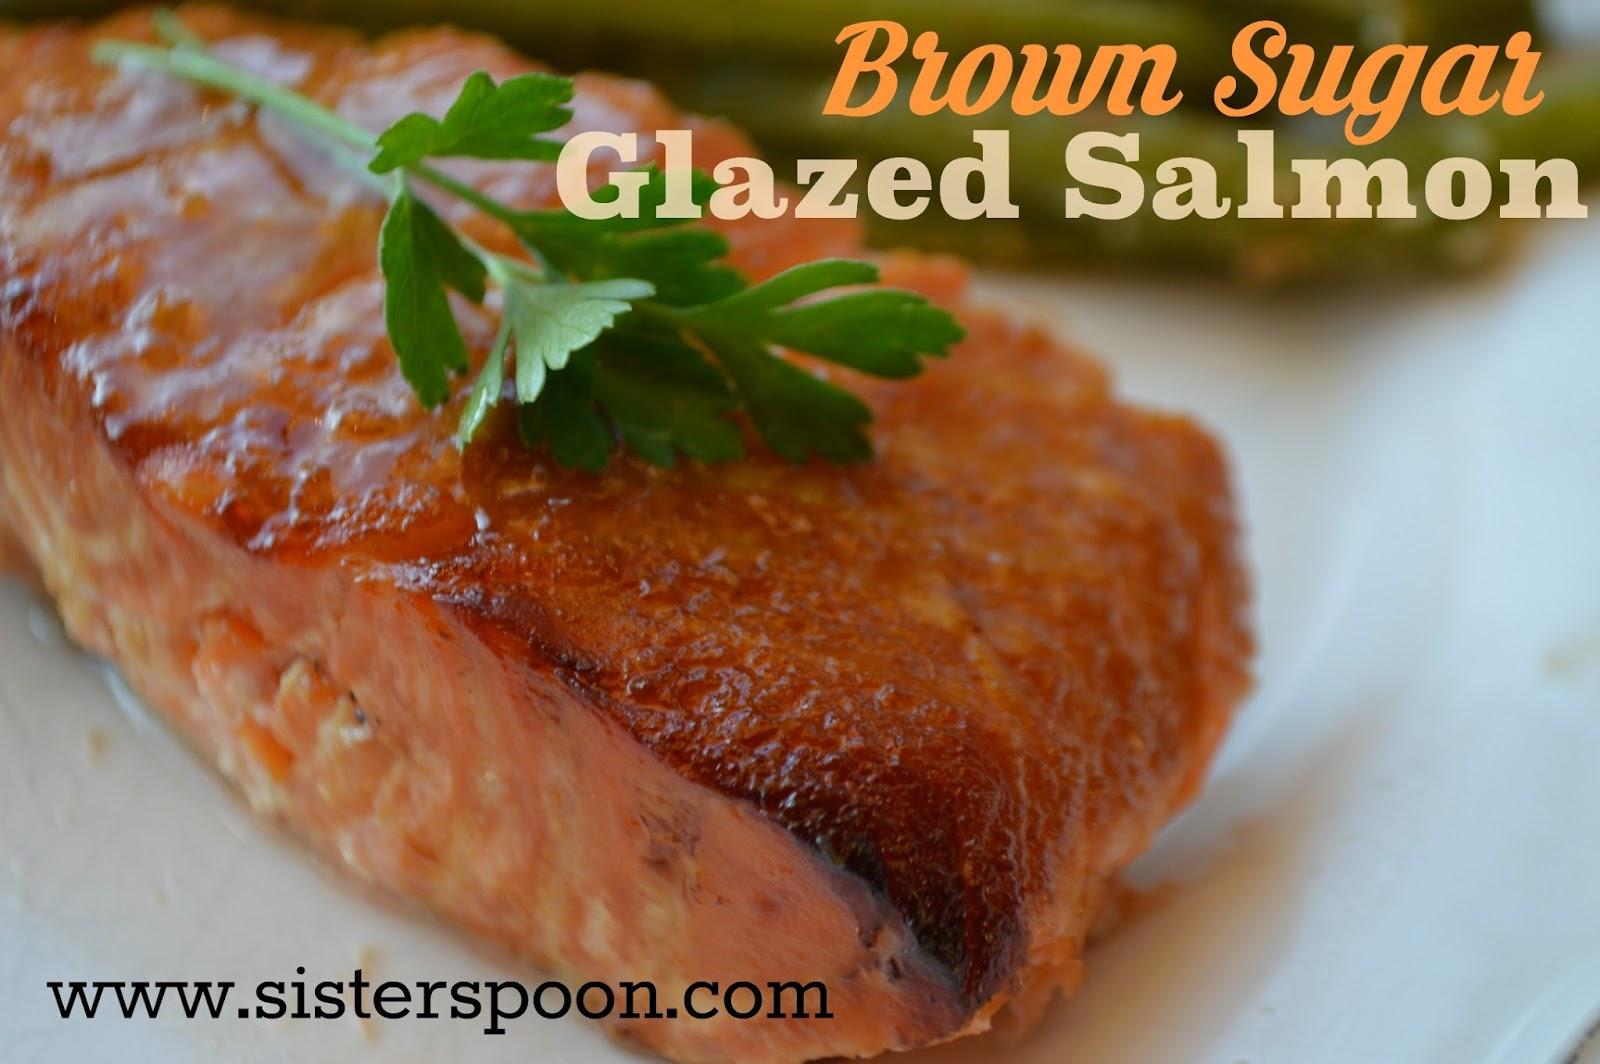 Sister Spoon Brown Sugar Glazed Salmon